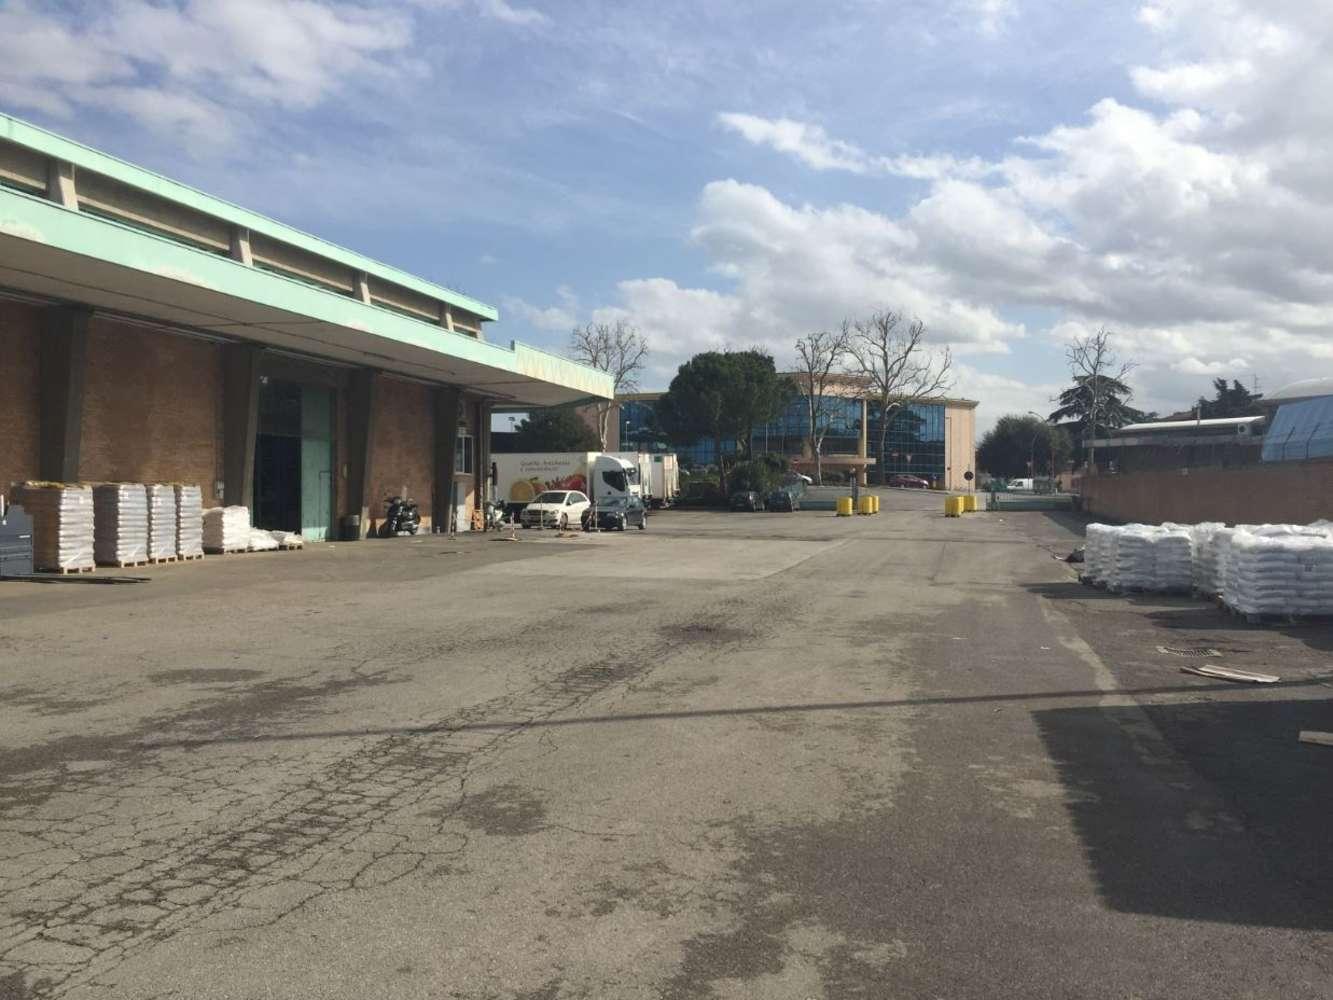 Magazzini industriali e logistici Cesena, 47521 - Cesena Warehouse - 9212972